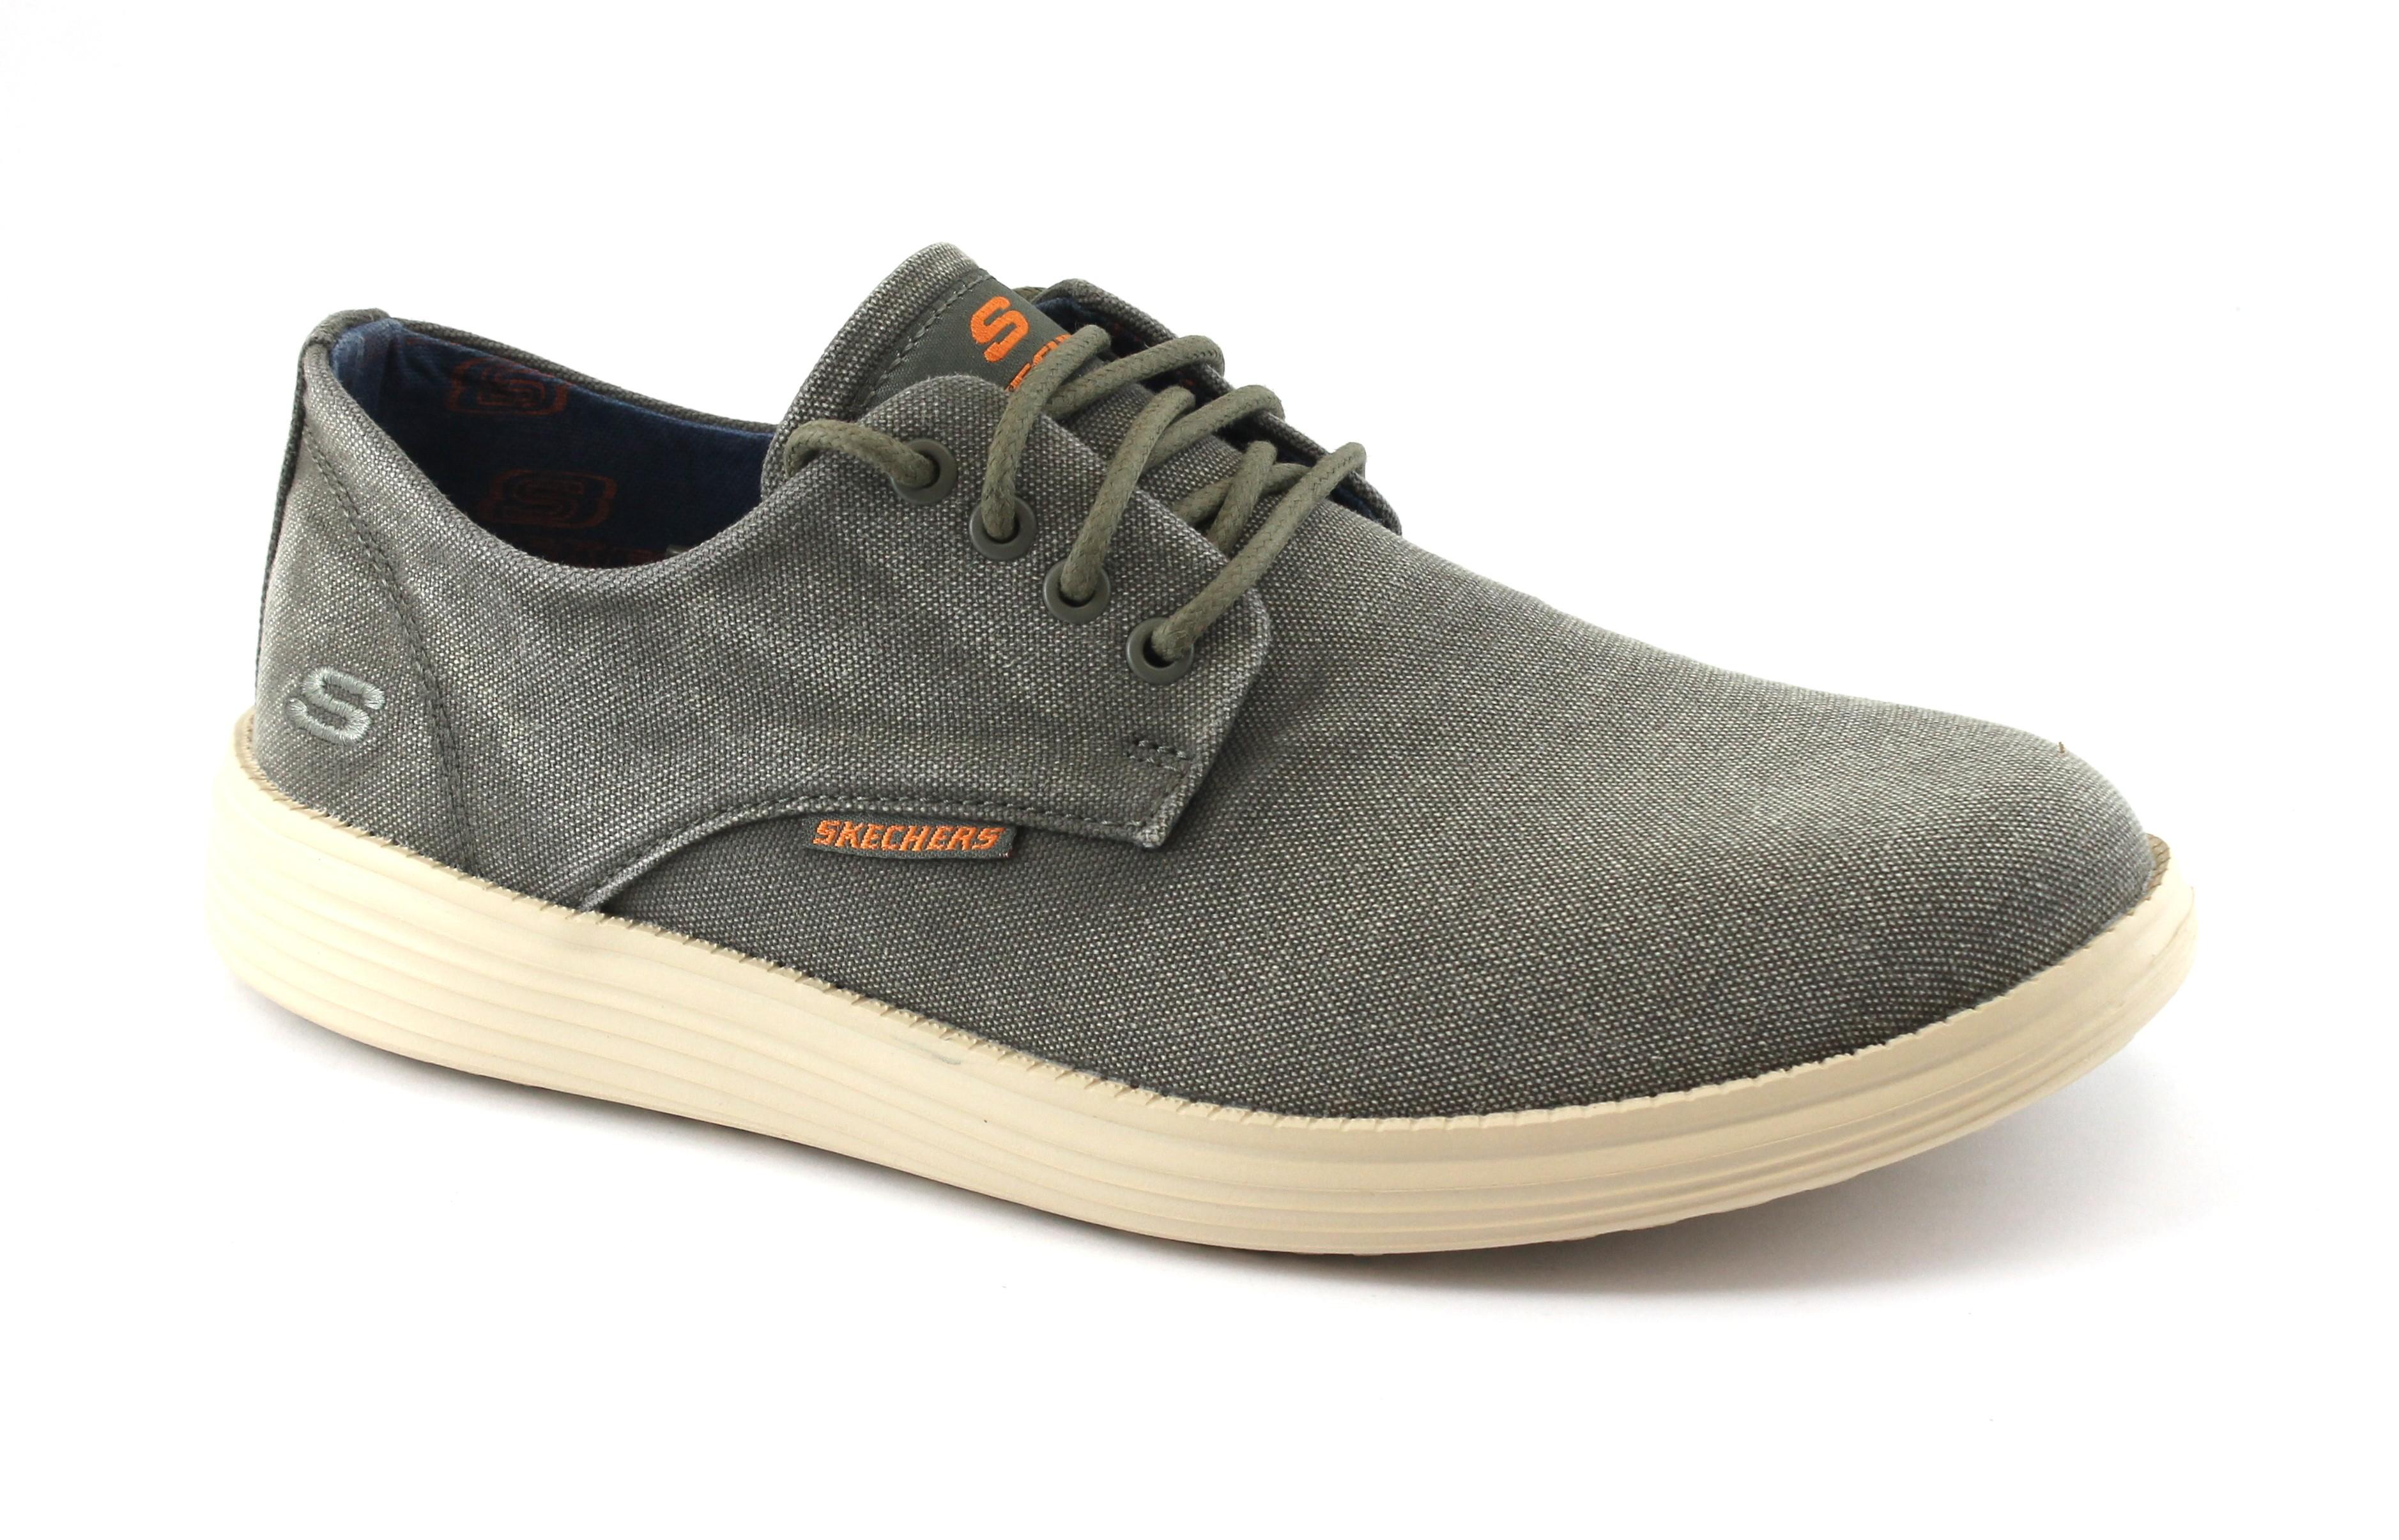 SKECHERS 64629 BORGES olive grigio scarpe uomo scarpe da ginnastica relaxed fit